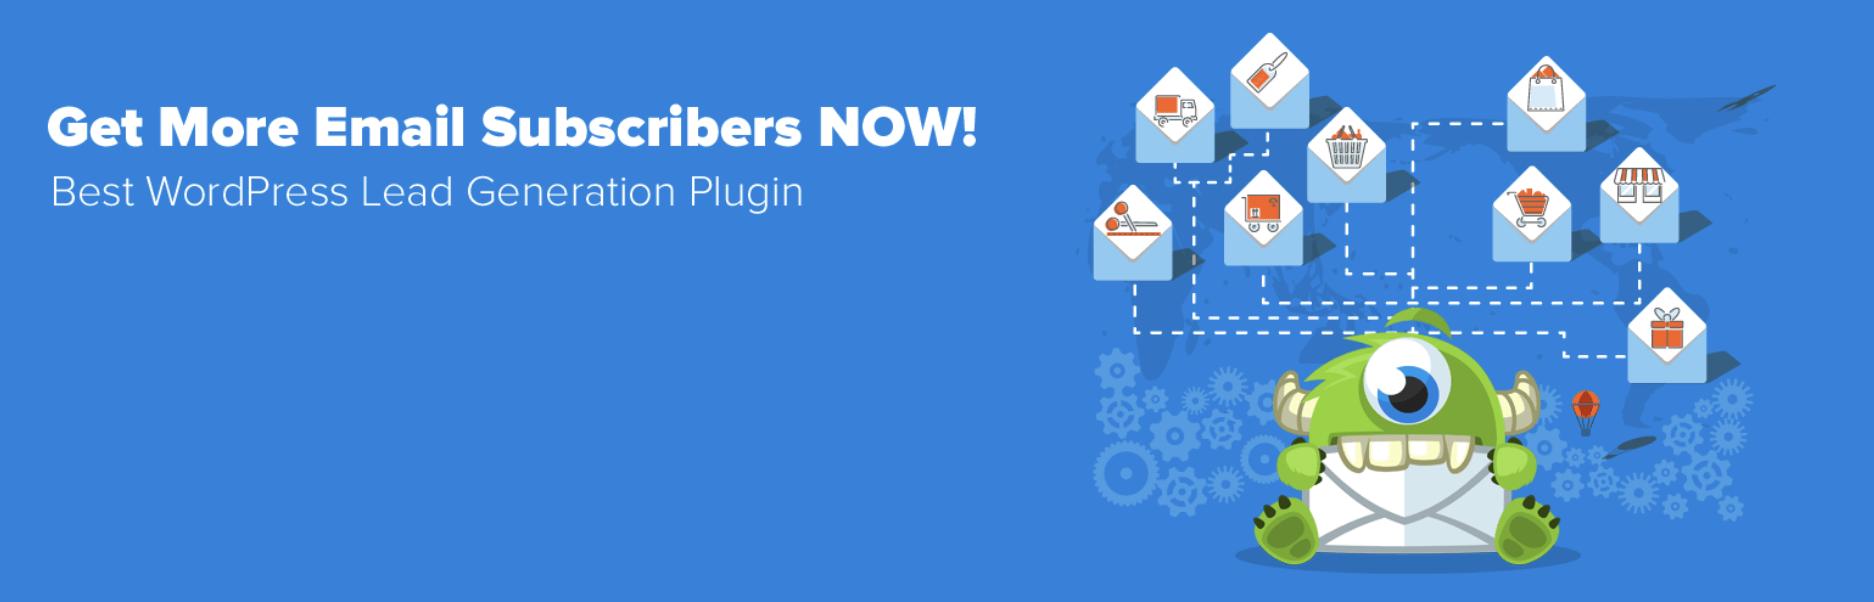 OptinMonster lead generation plugin